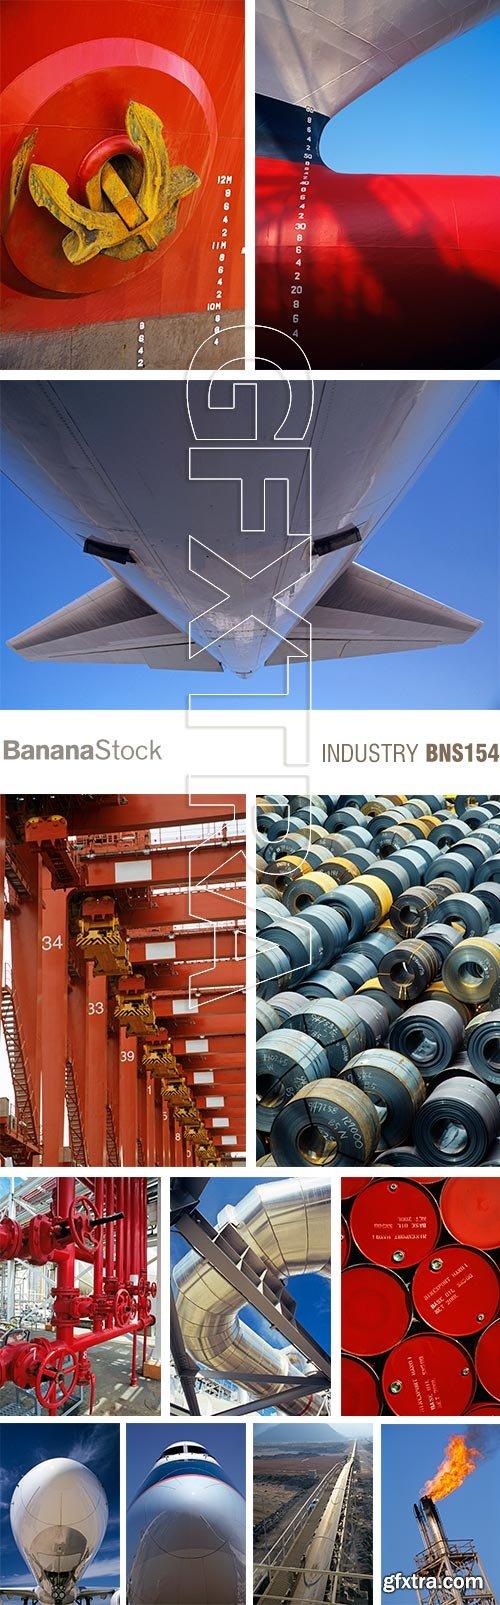 BananaStock BNS154 Industry